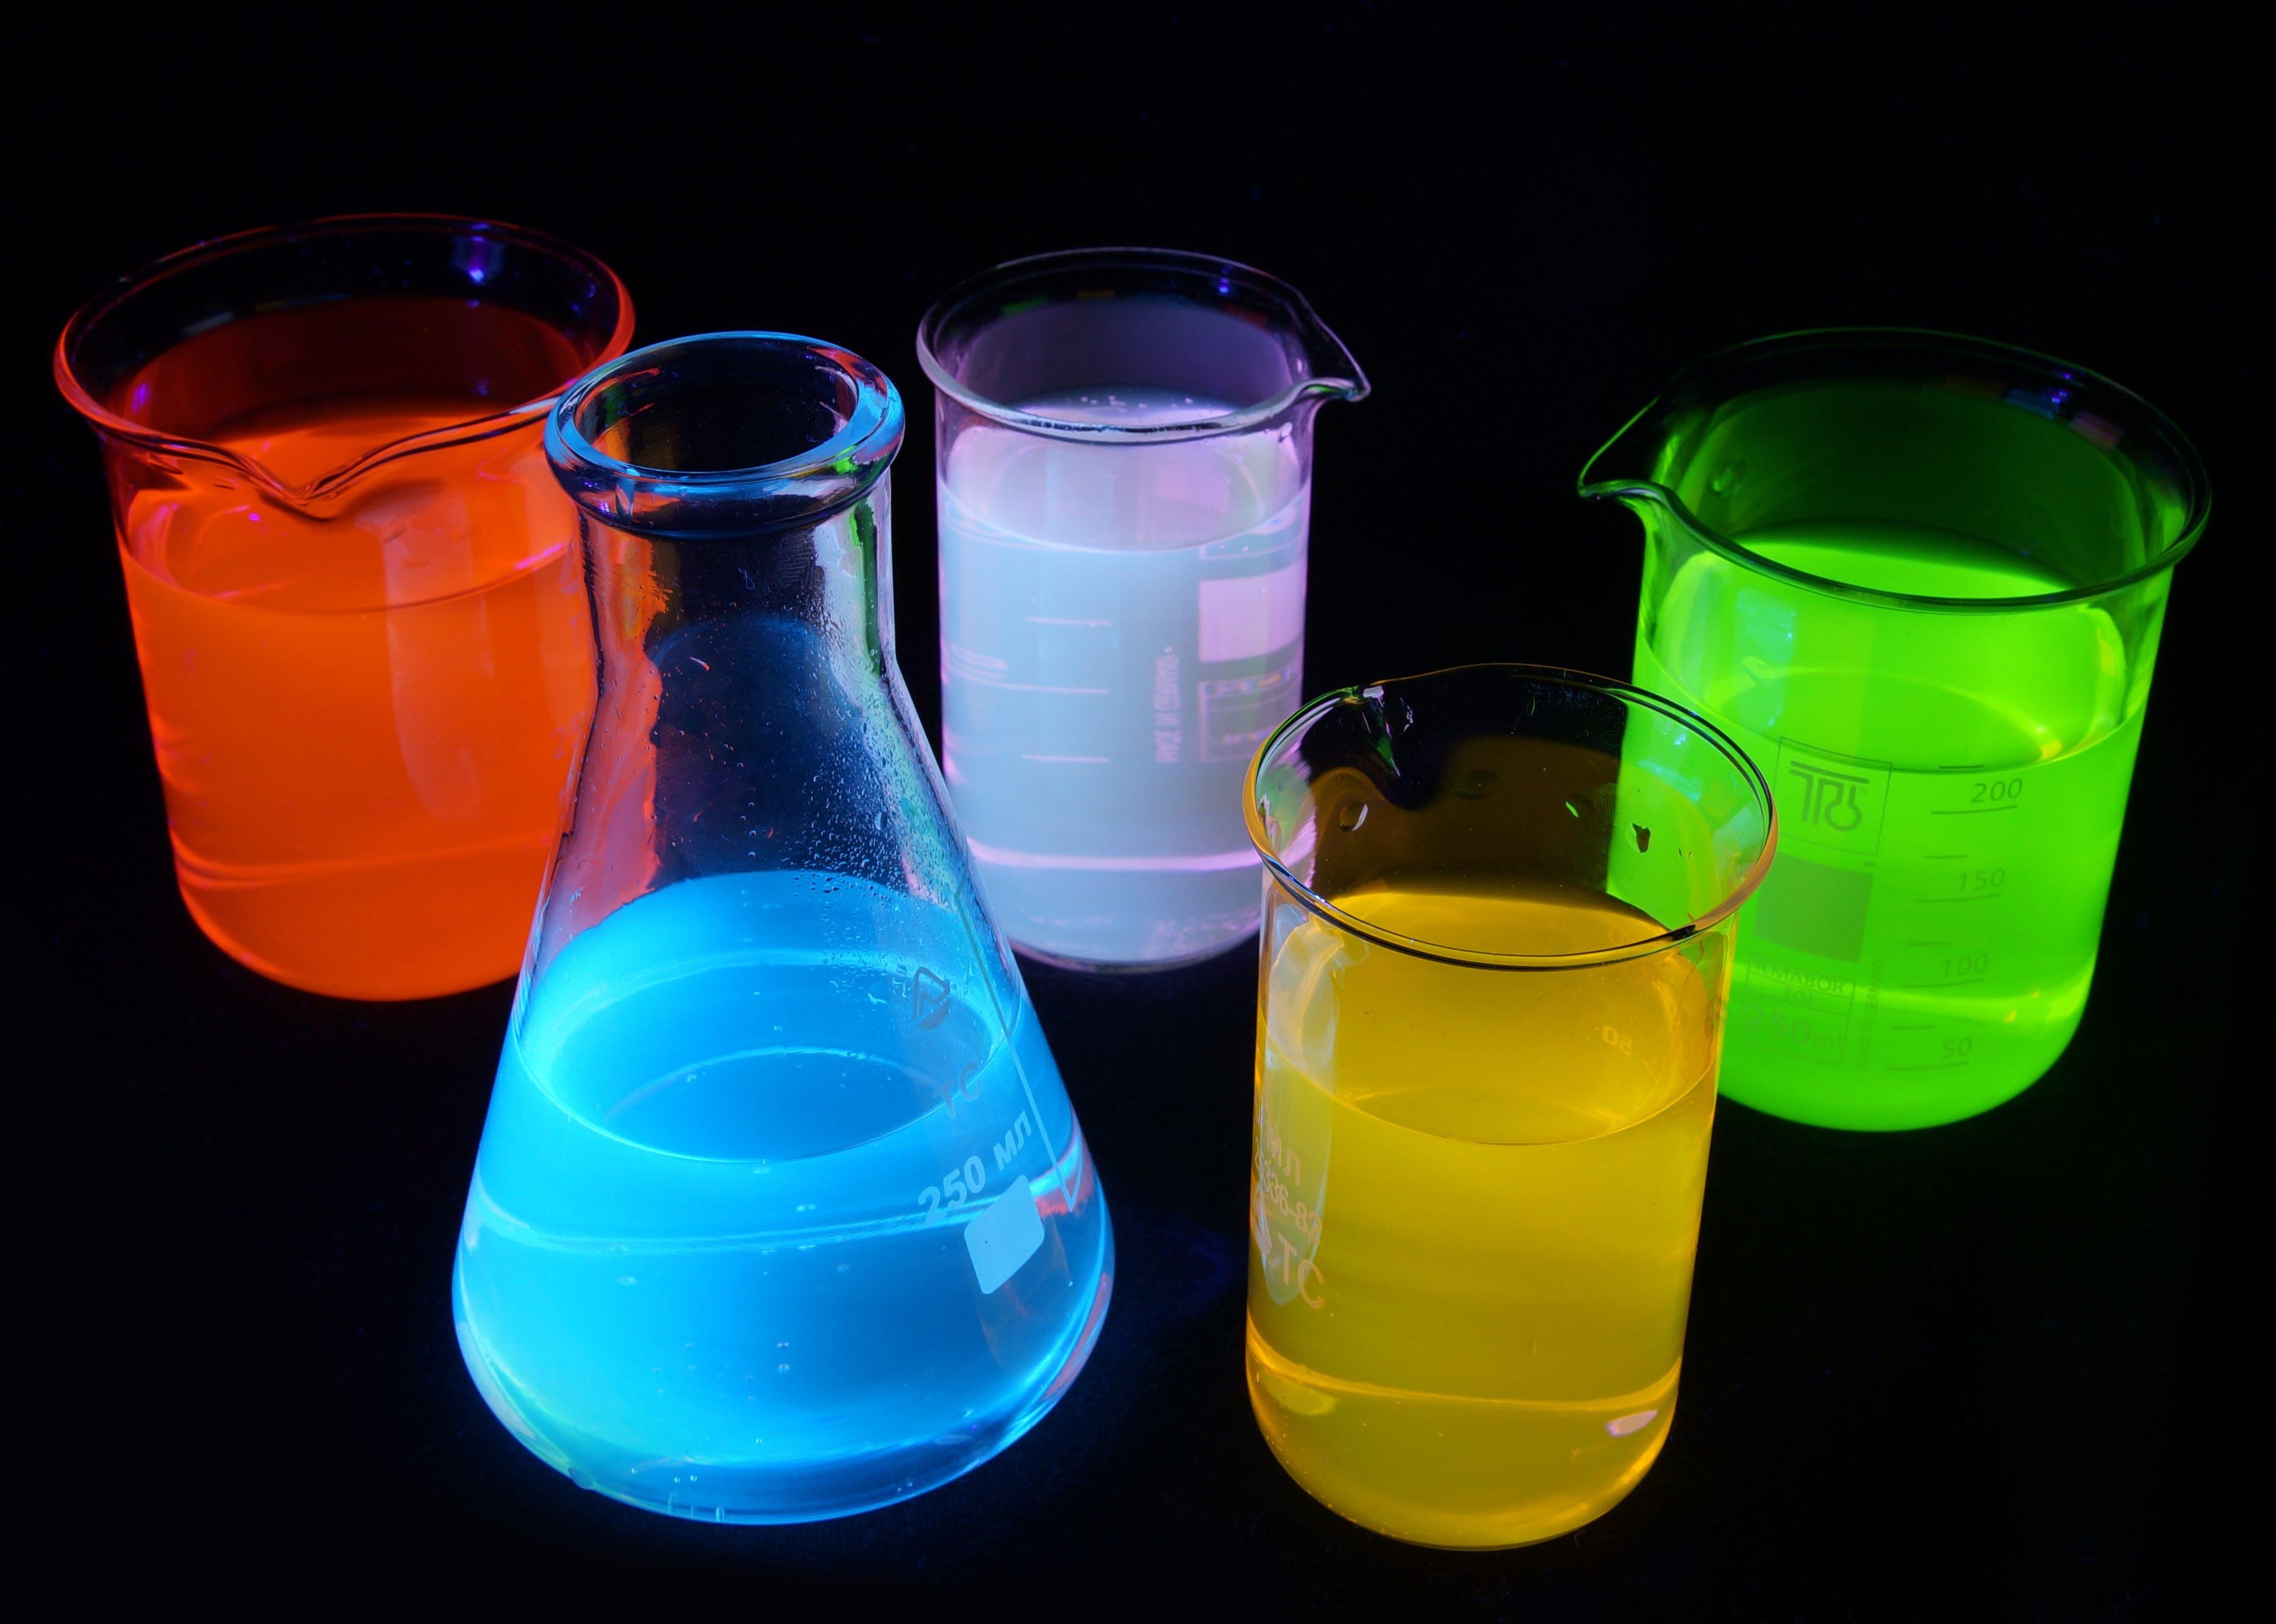 Rainbow test tubes